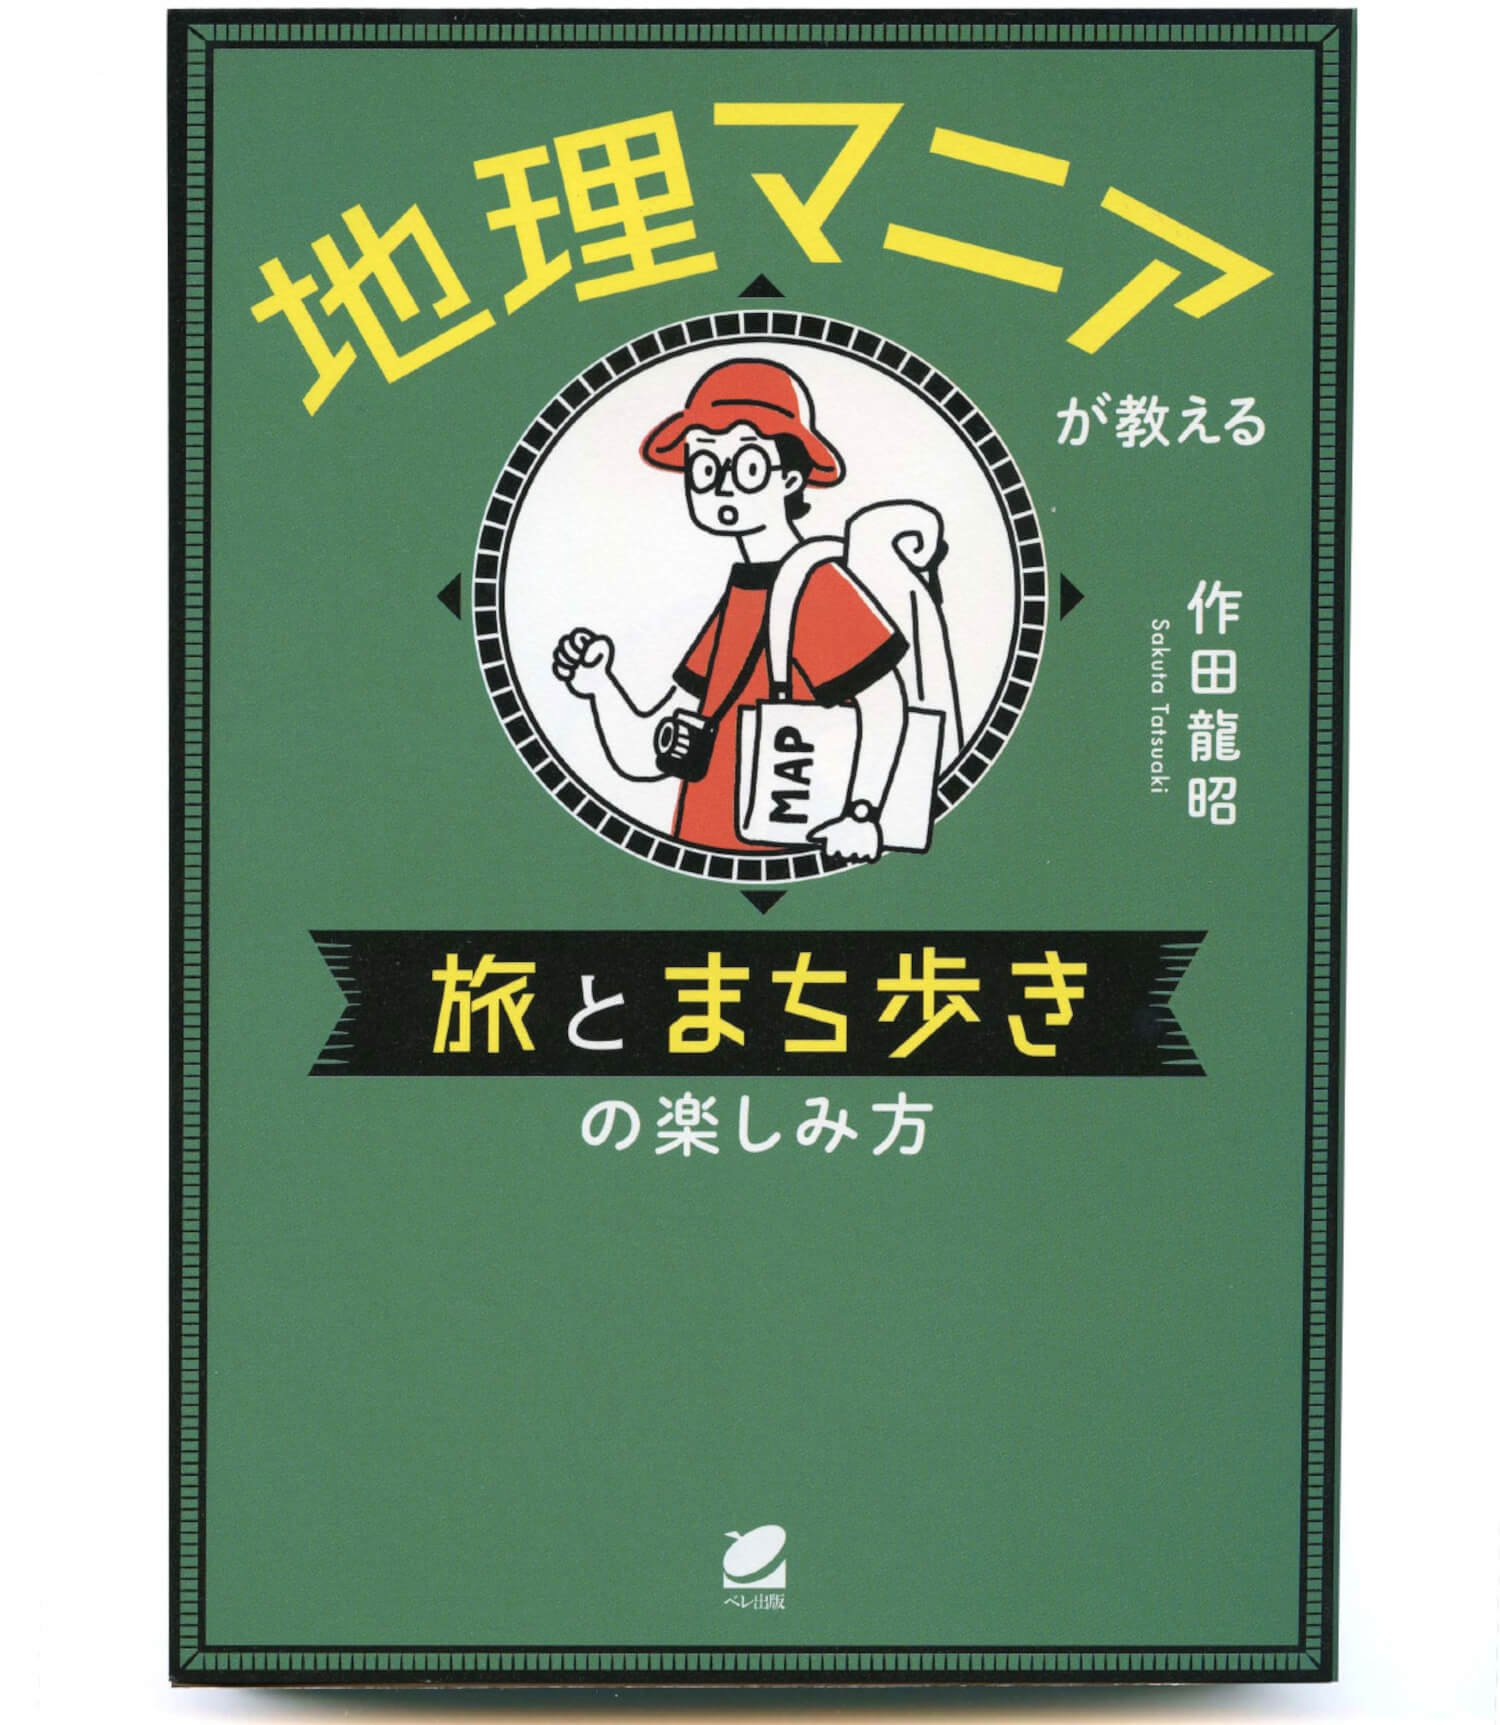 作田龍昭 著/ ベレ出版/ 1793円+税